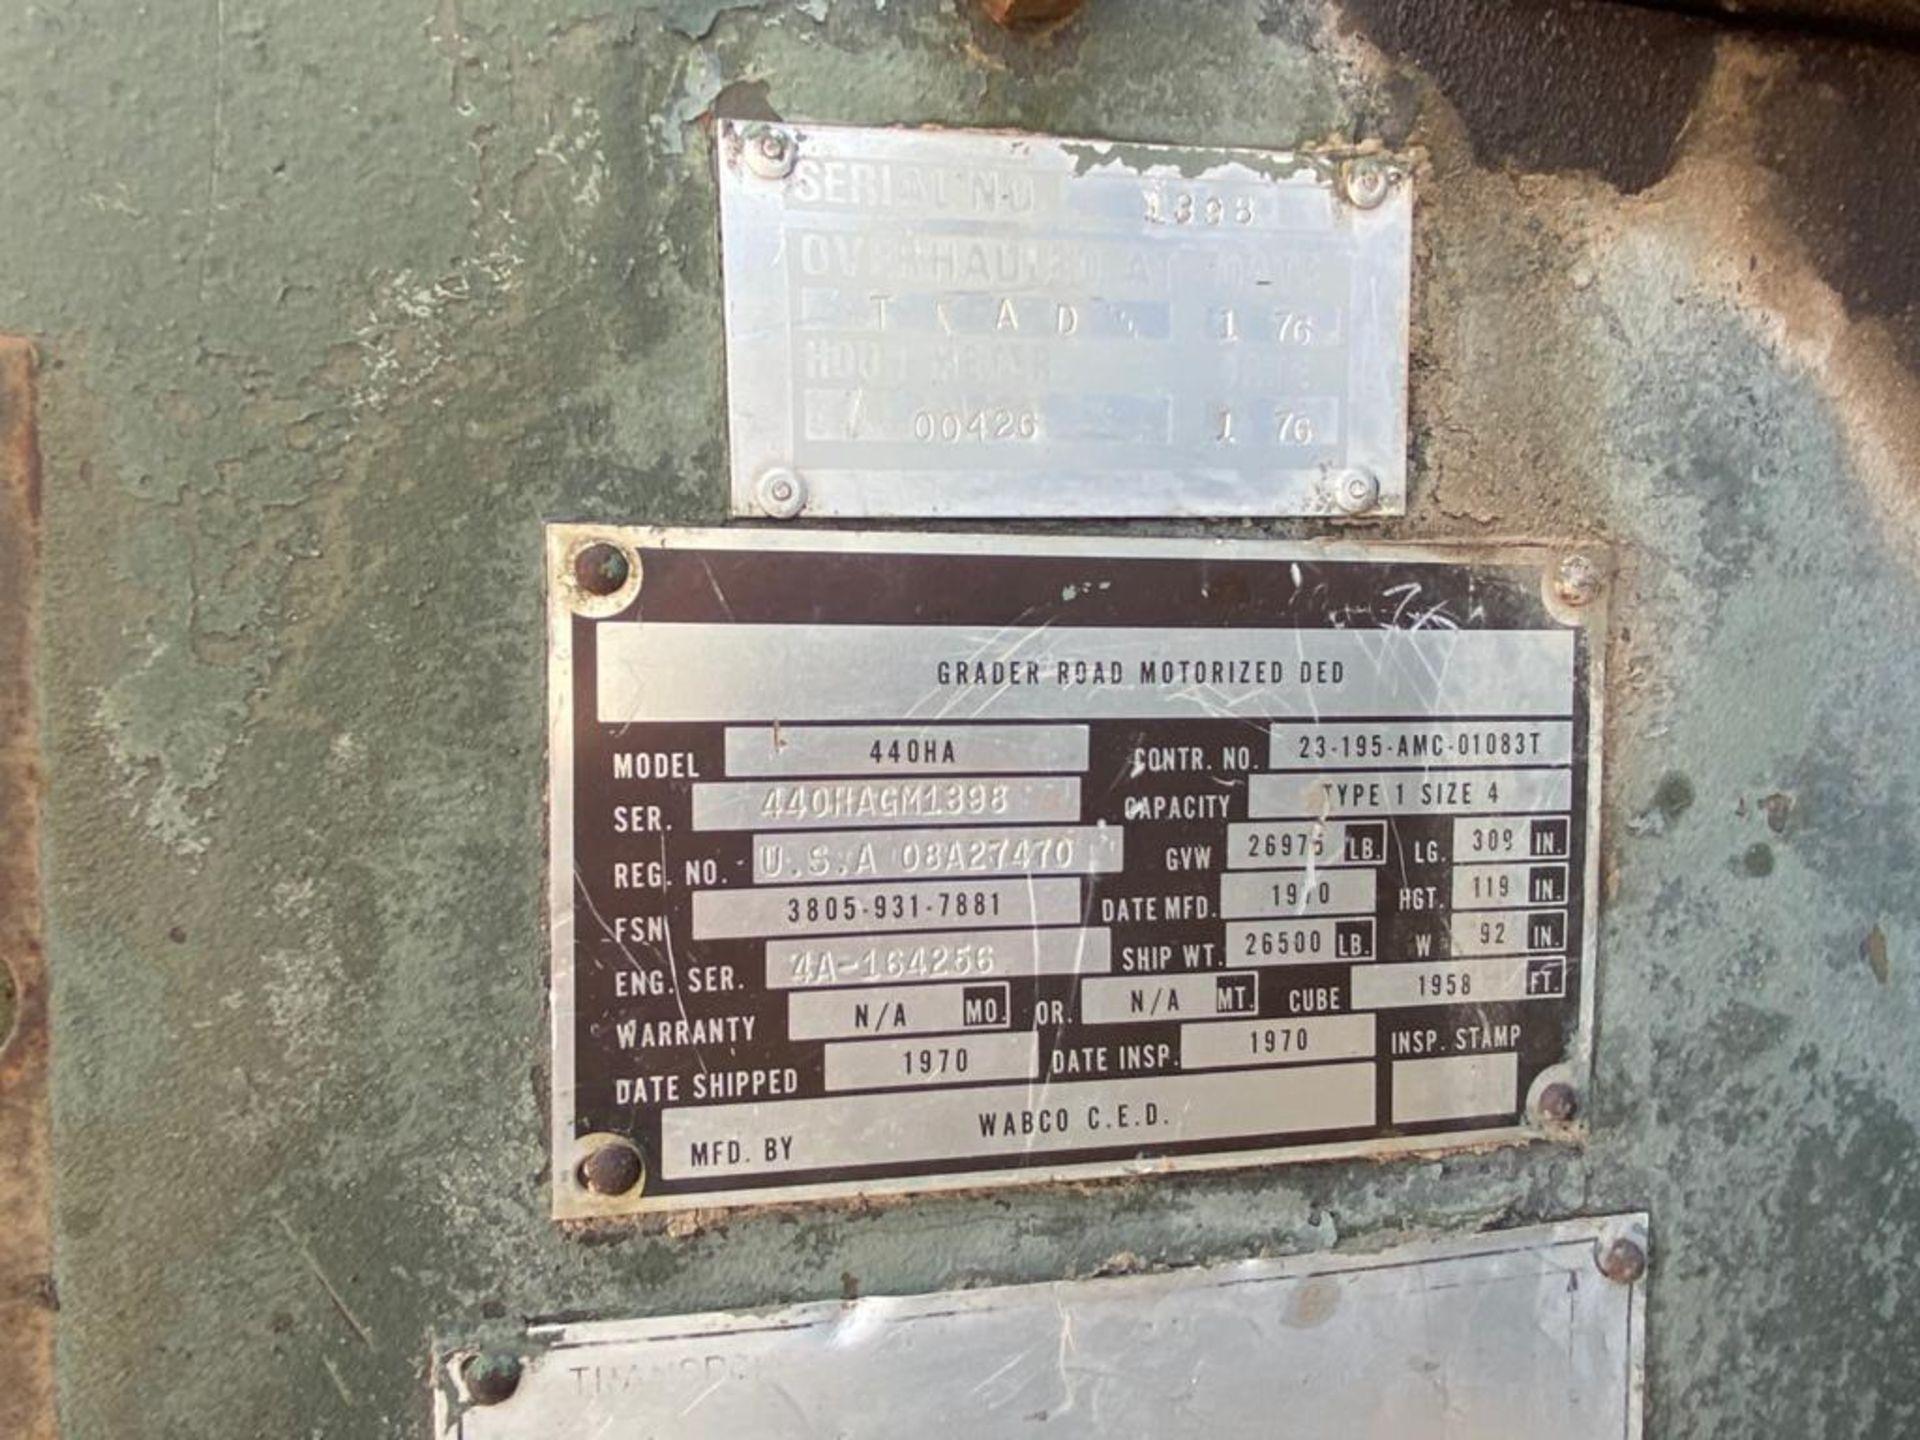 1970 Wabco4 440H Motor Grader, Serial number 440HAGM1398, Motor number 4A156316*RC*4057C - Image 65 of 77